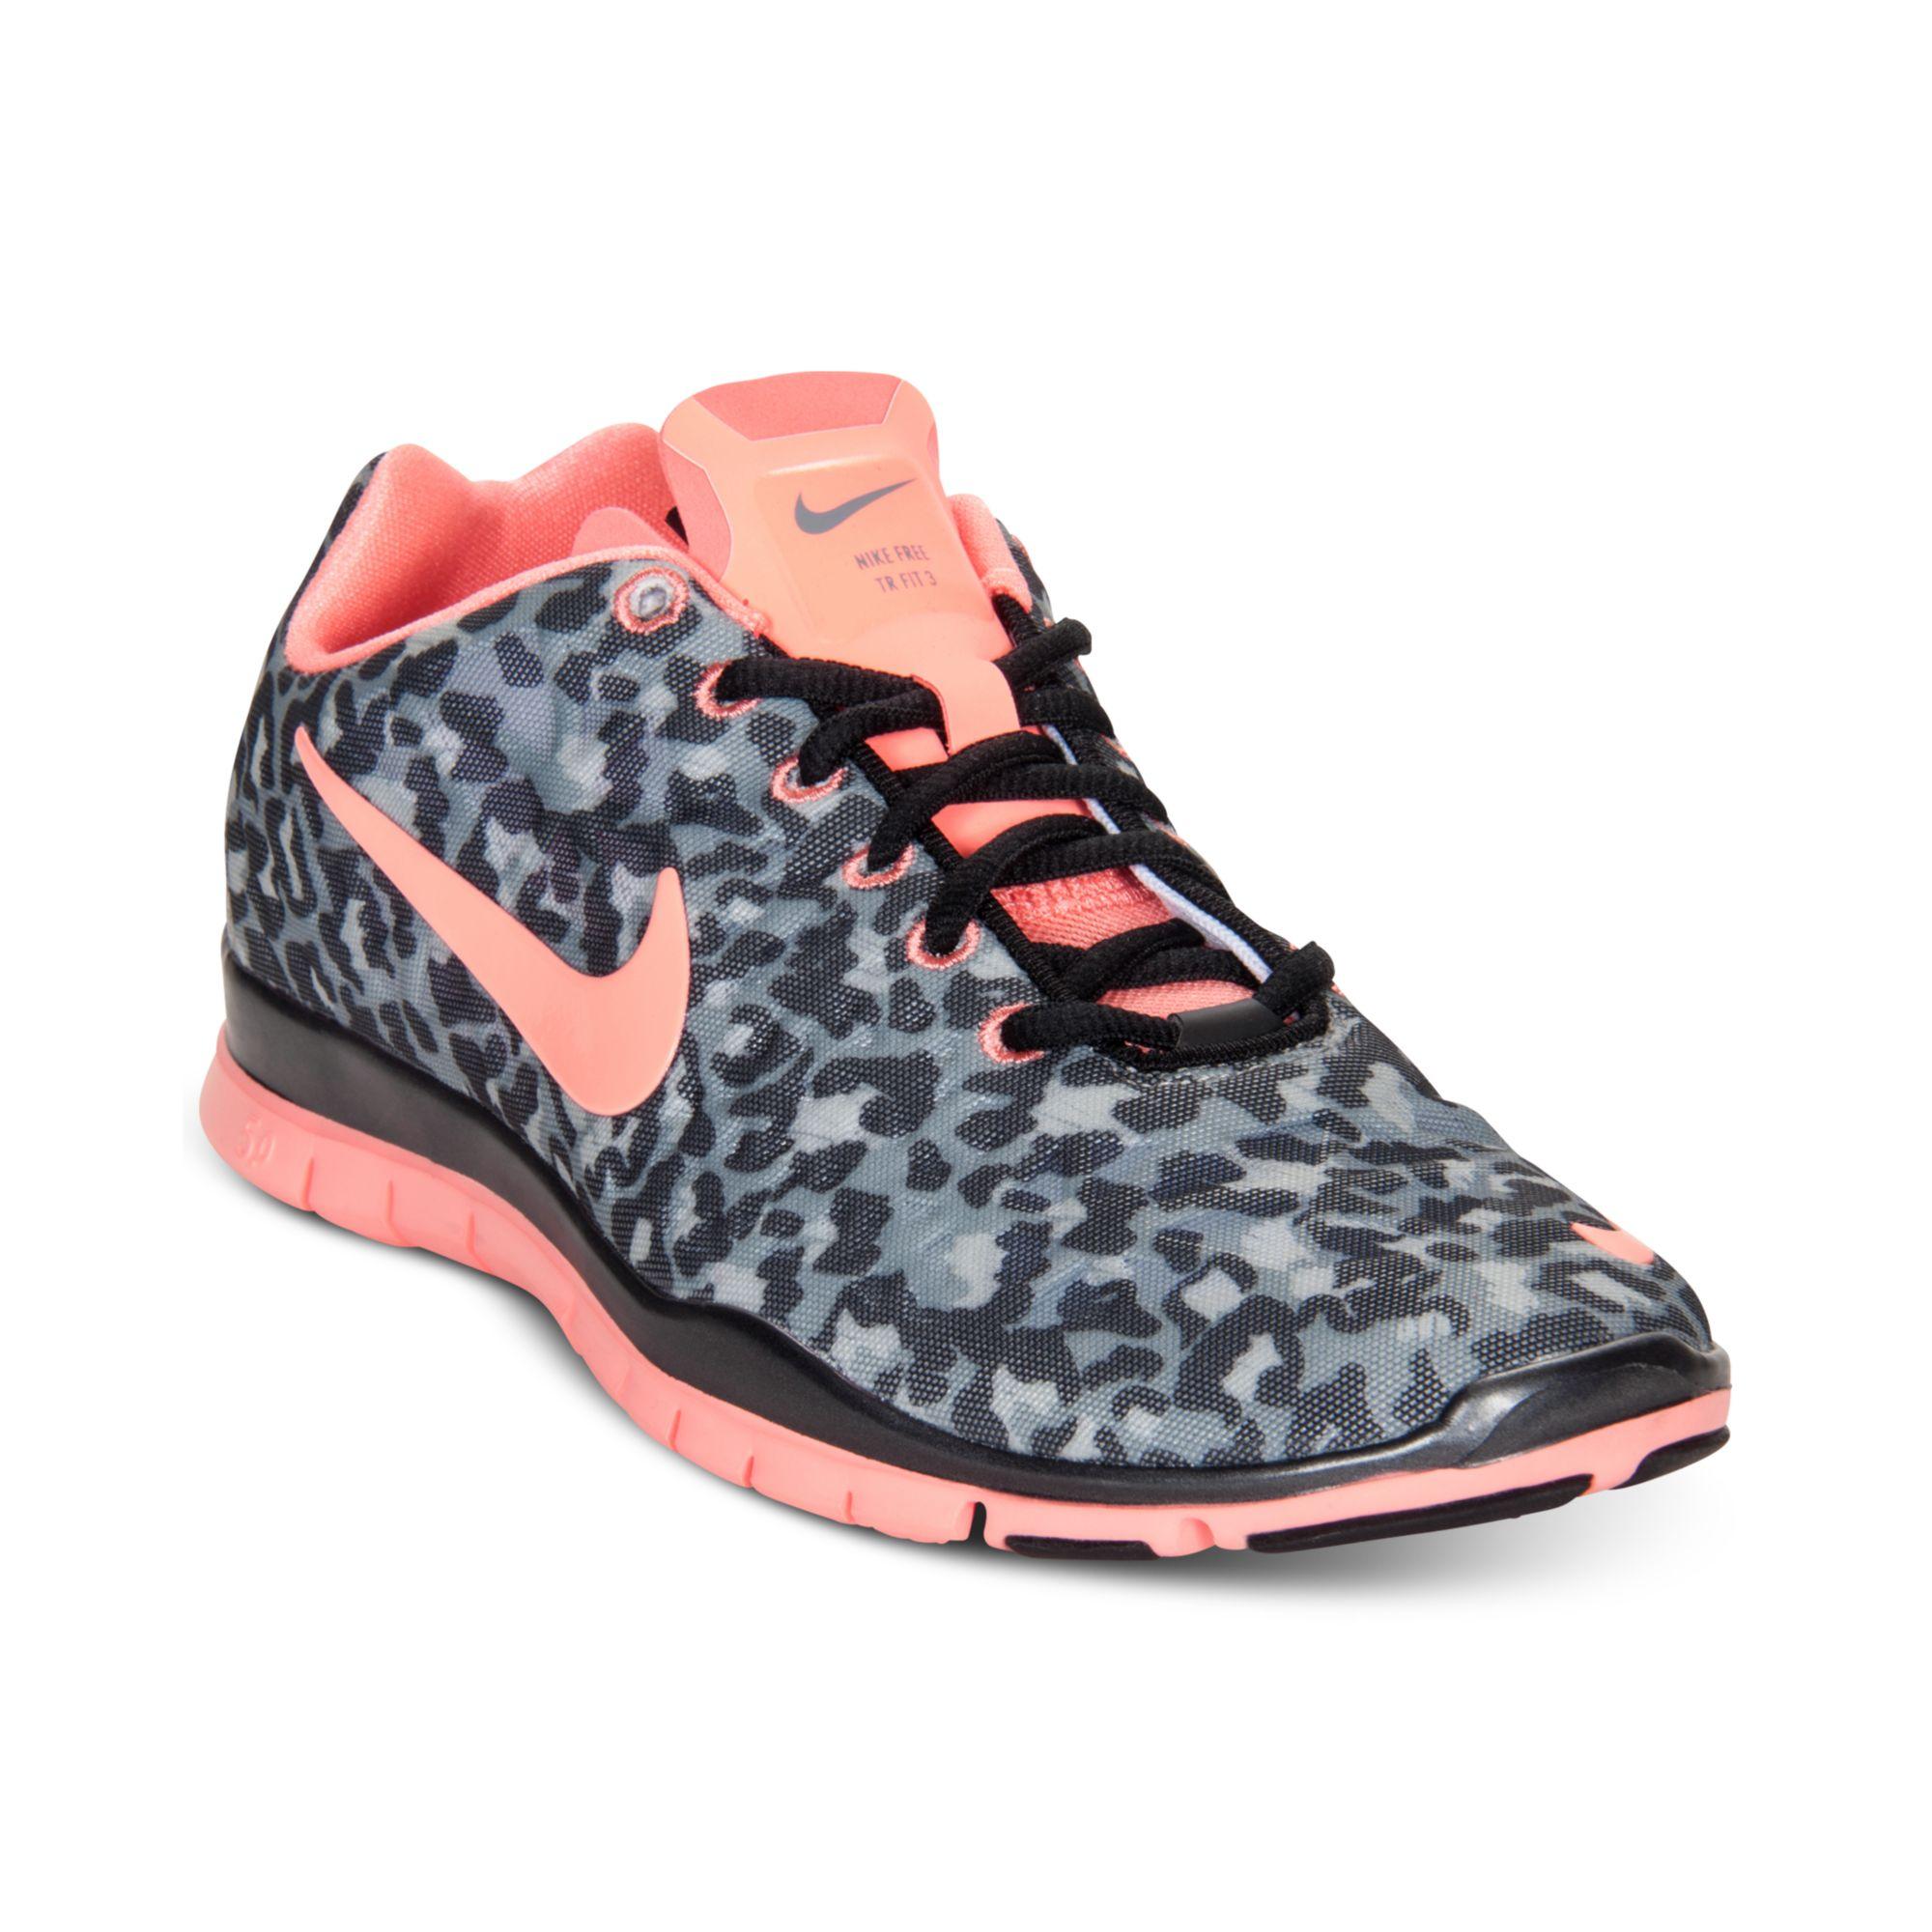 Nike Wmns Libre Tr Sadapter 3 Prt Imprimé Léopard 2013 Femmes Chaussures Cross-training